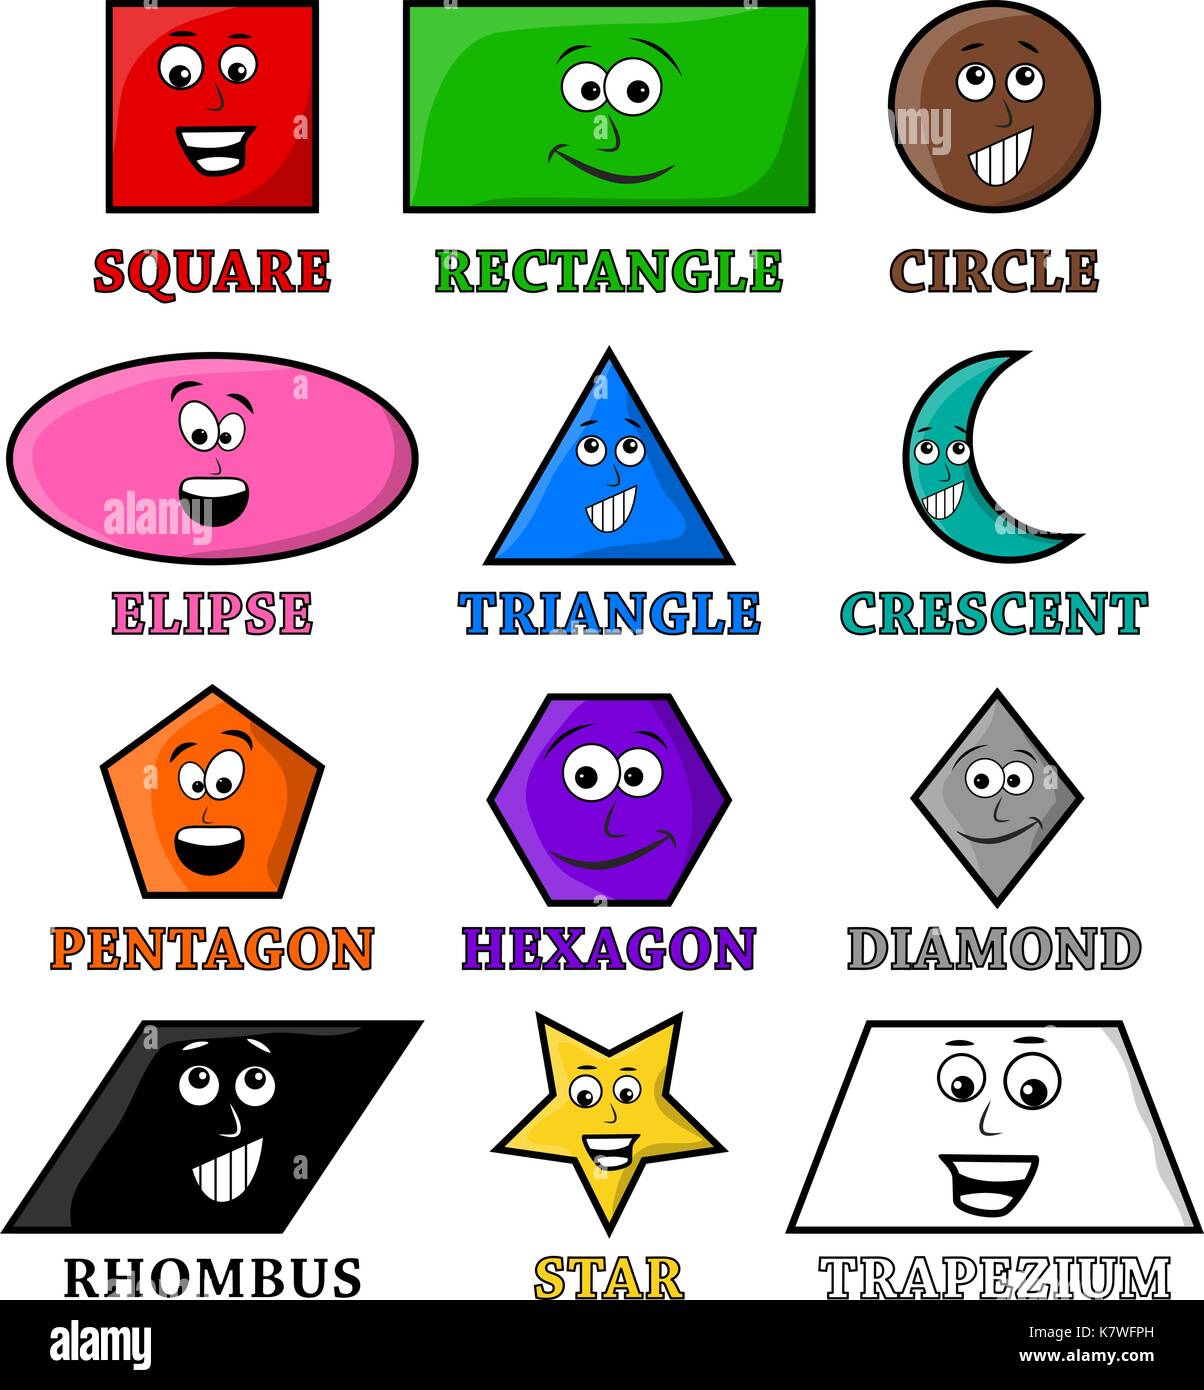 Education Illustration Shape Geometry Cartoon Stock Photos